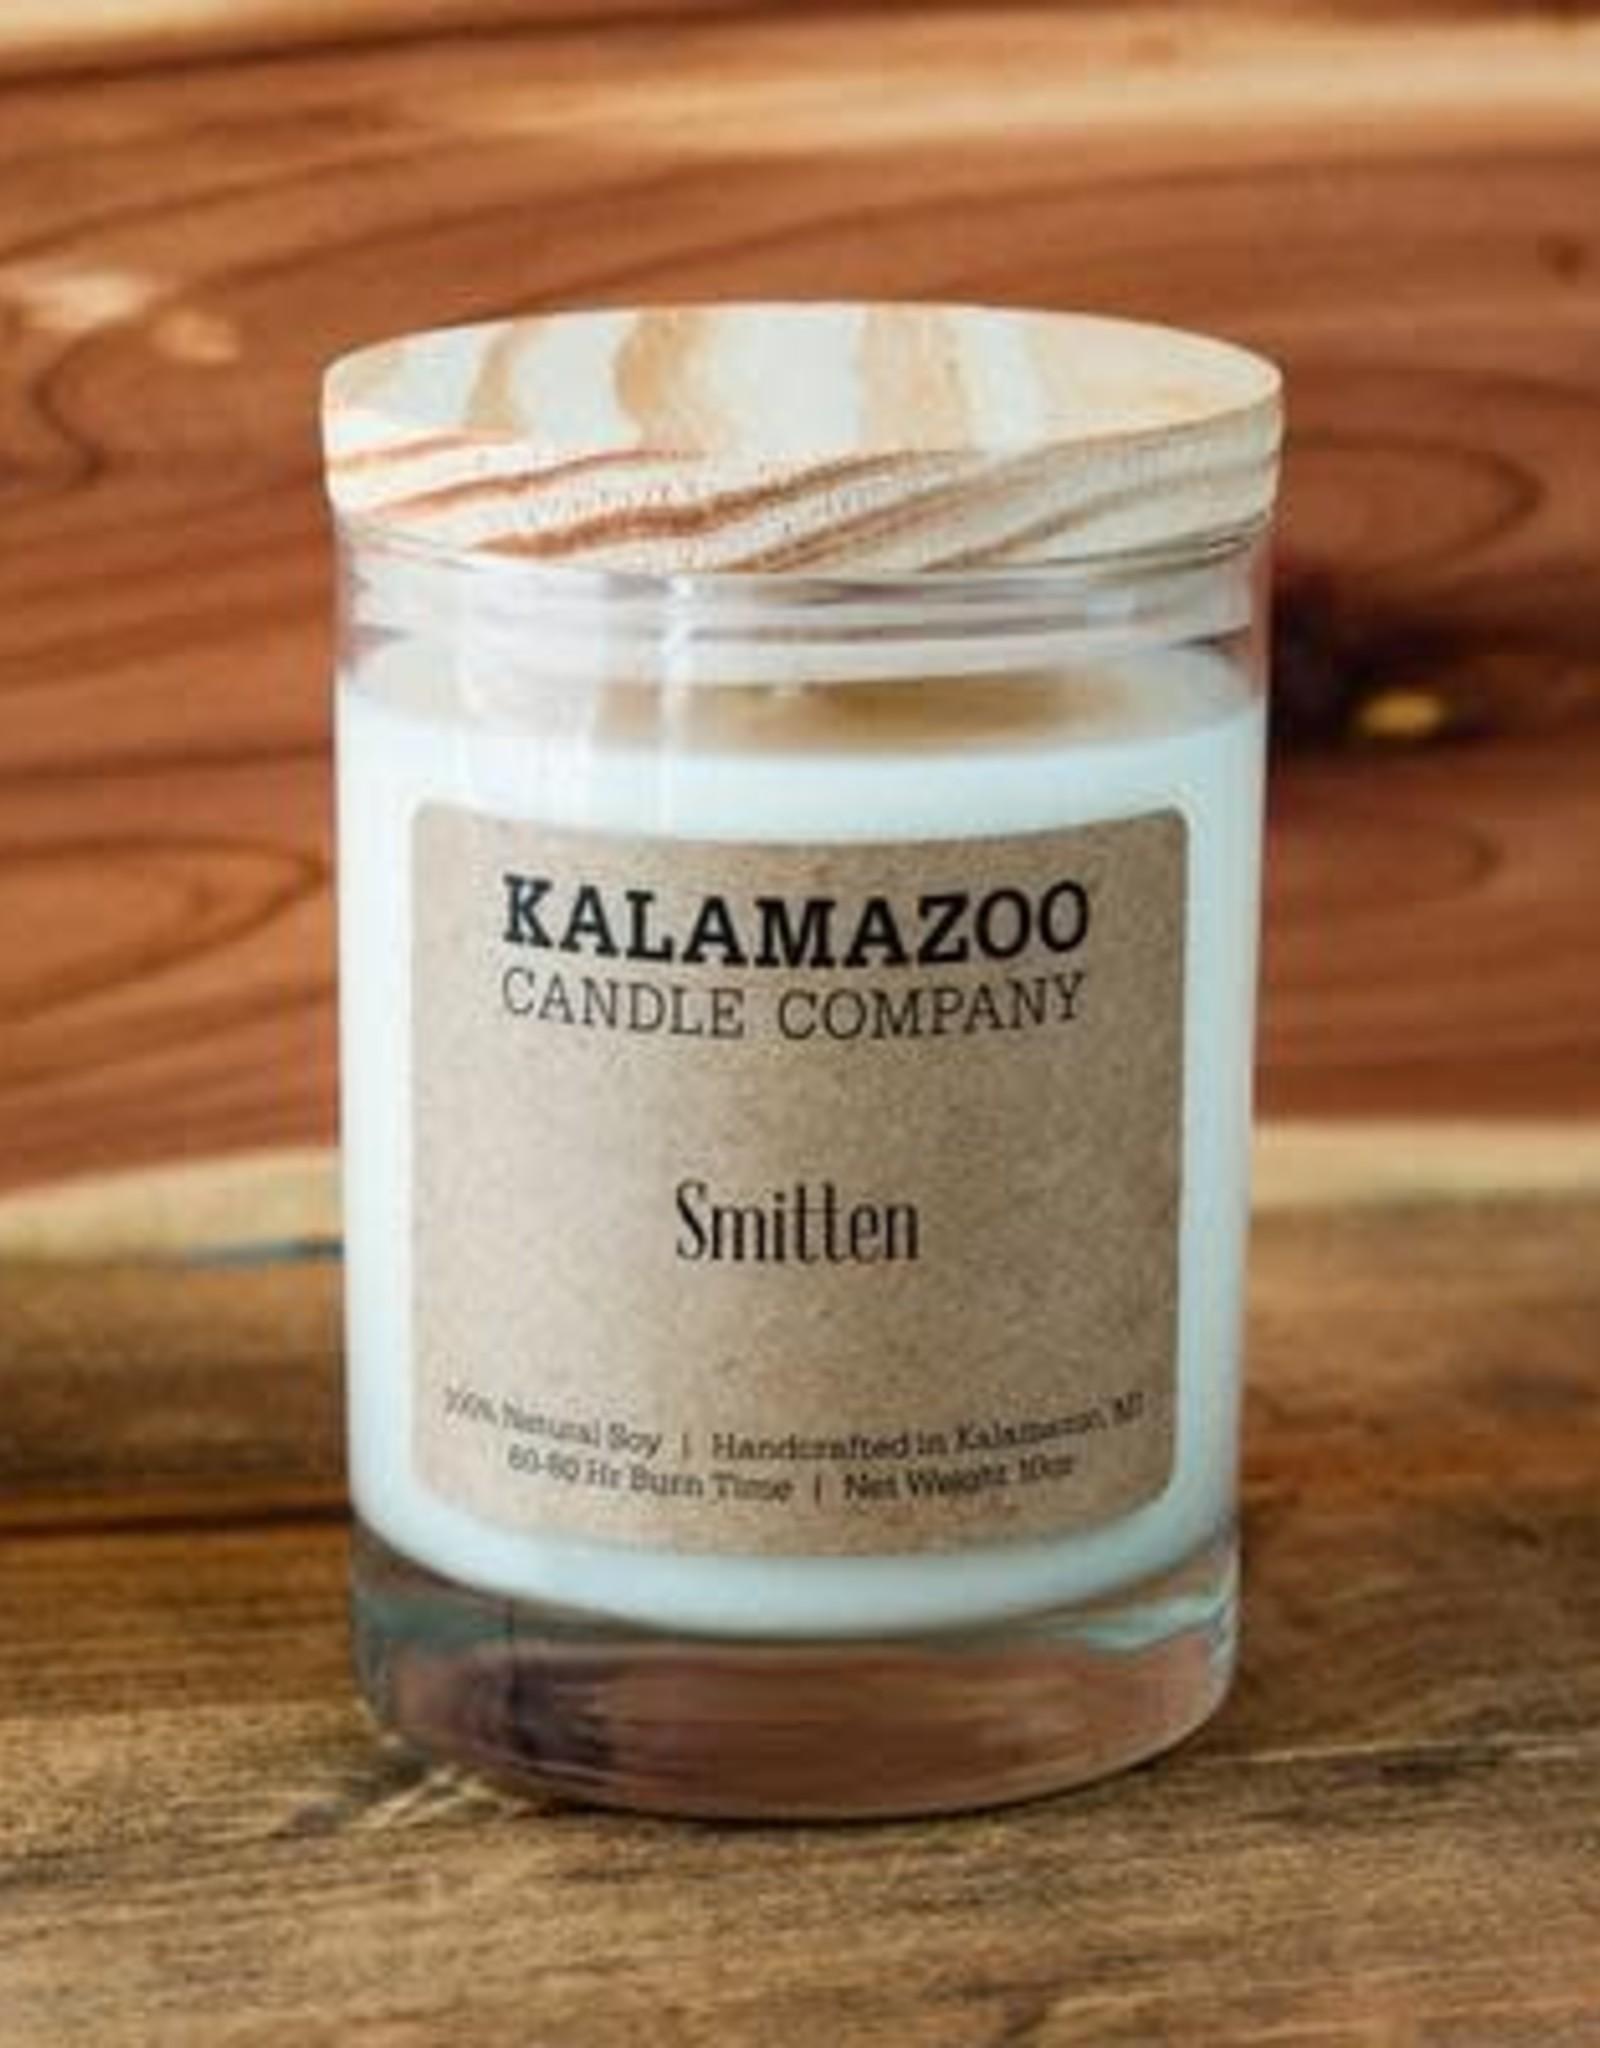 Kalamazoo Candle Company 10oz Candle Smitten